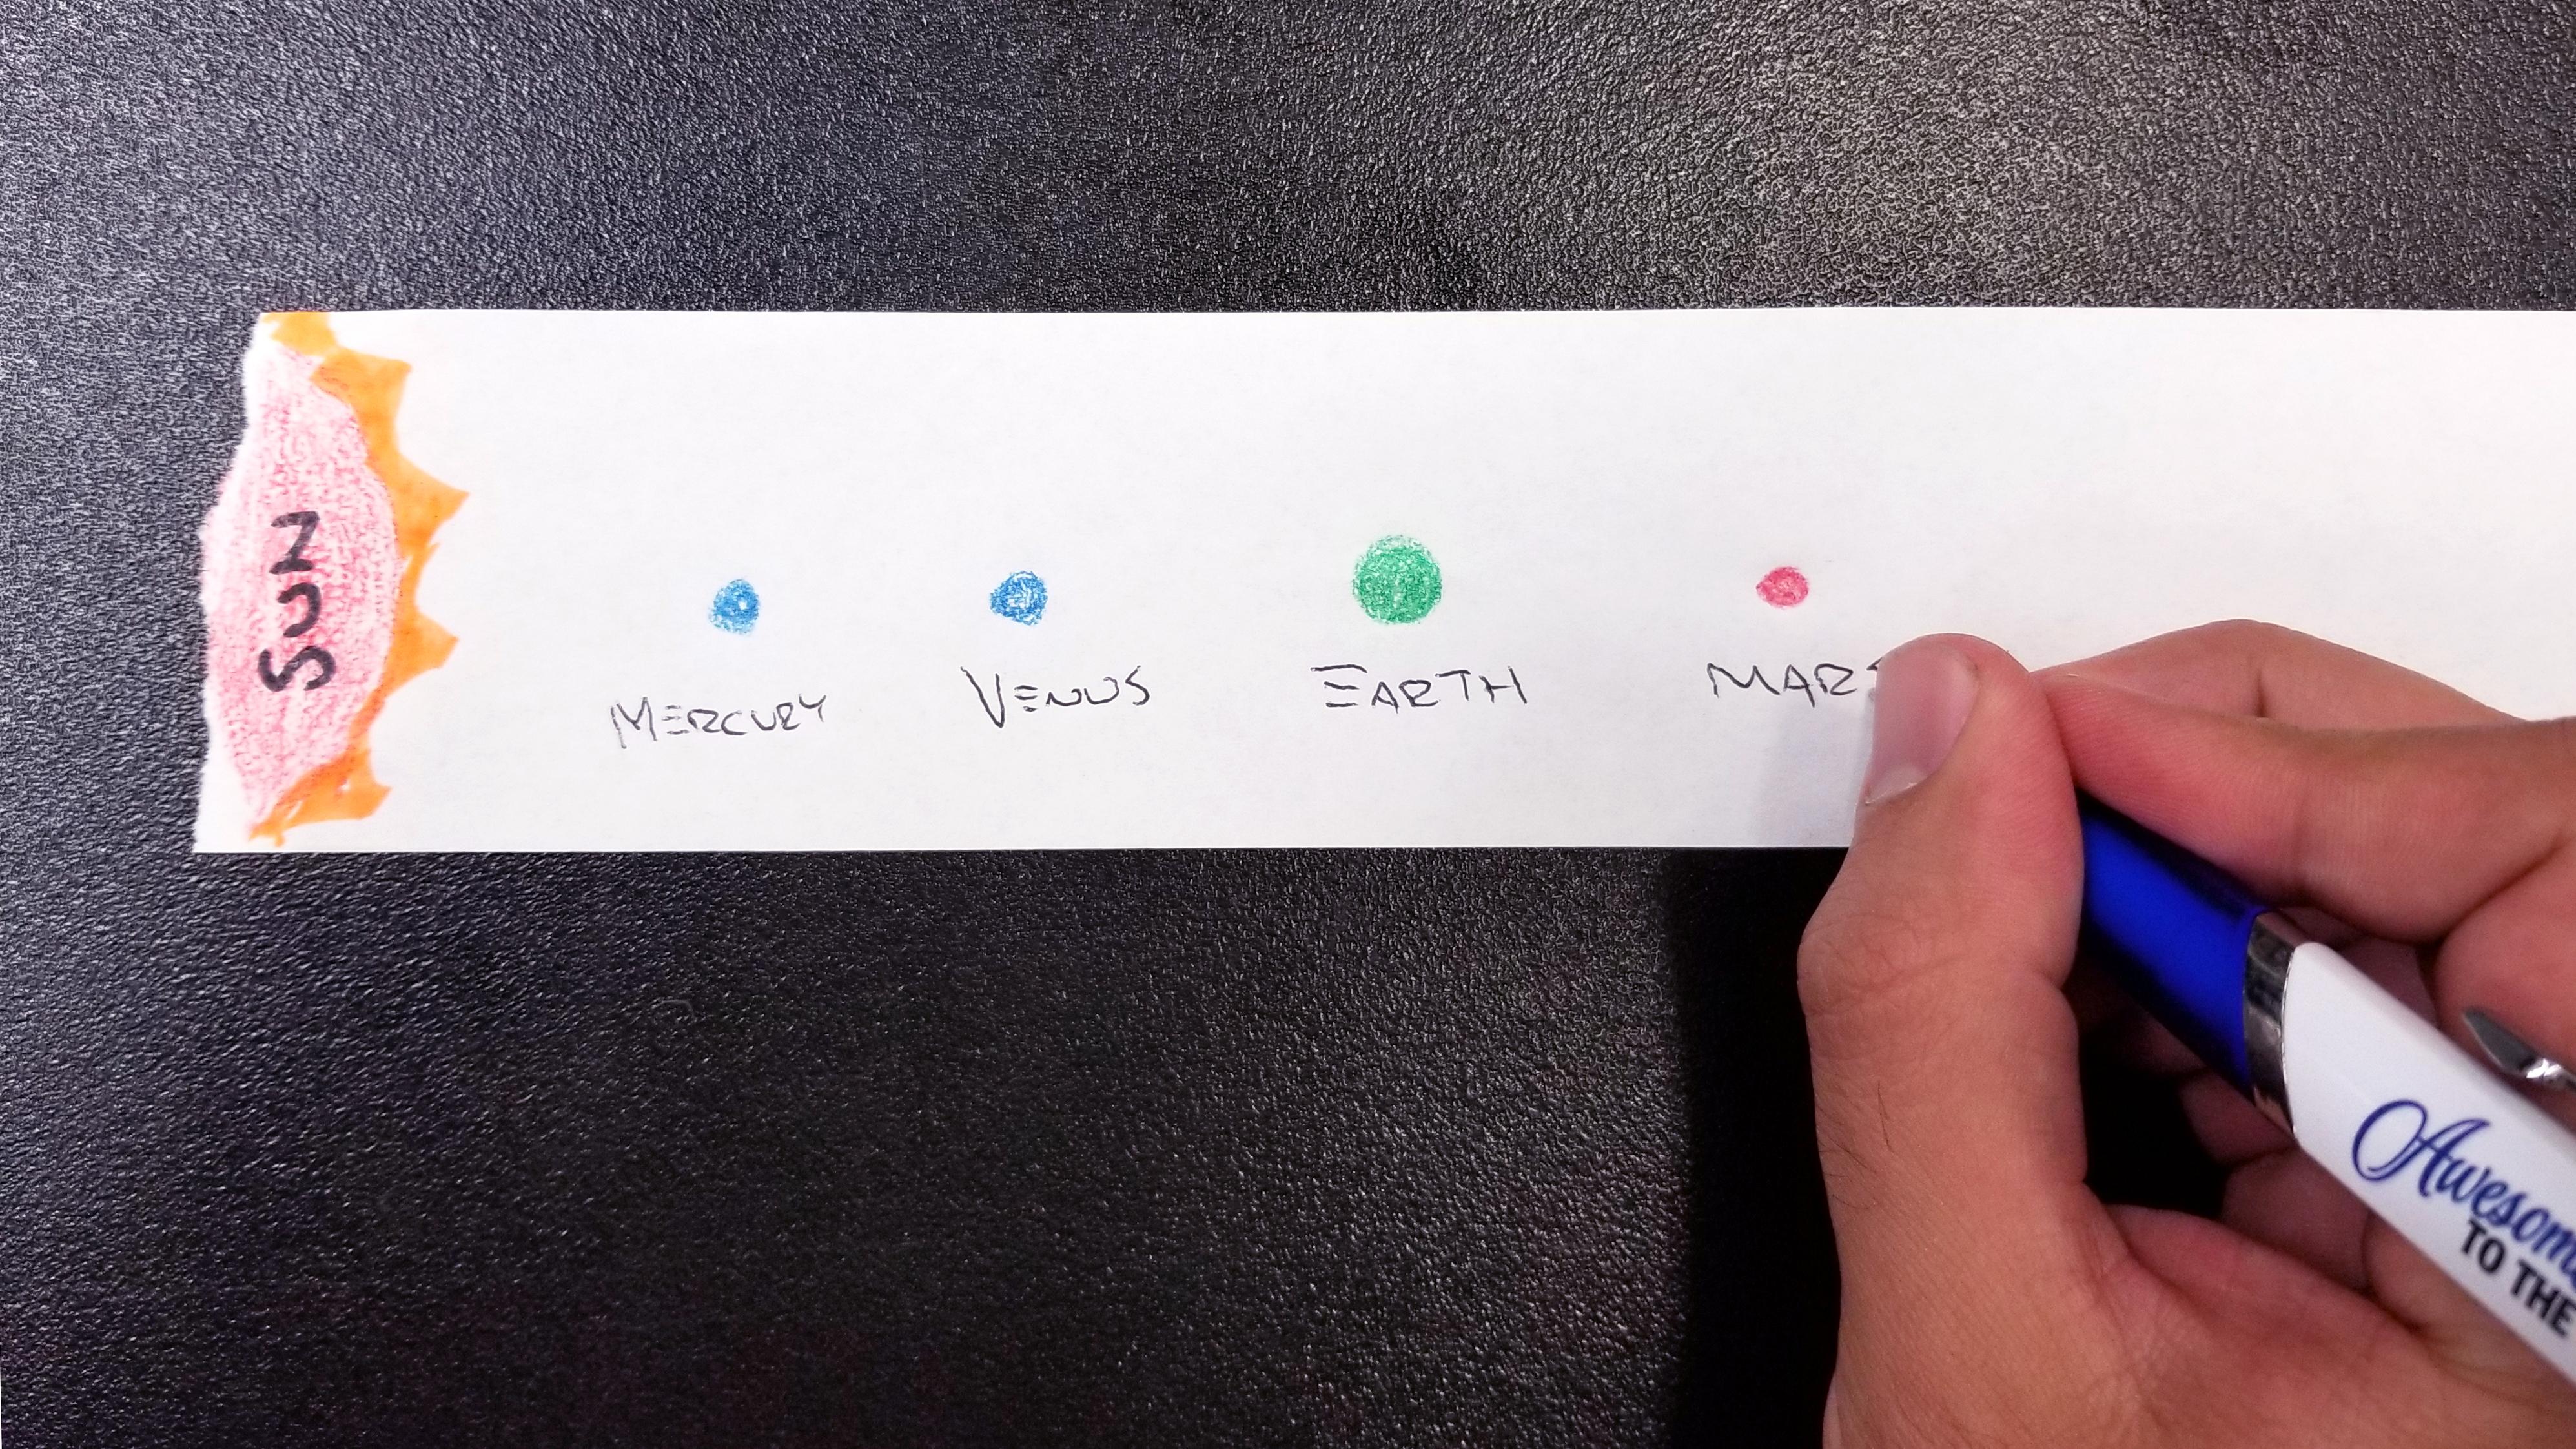 Solar System Scroll Activity - Step 2